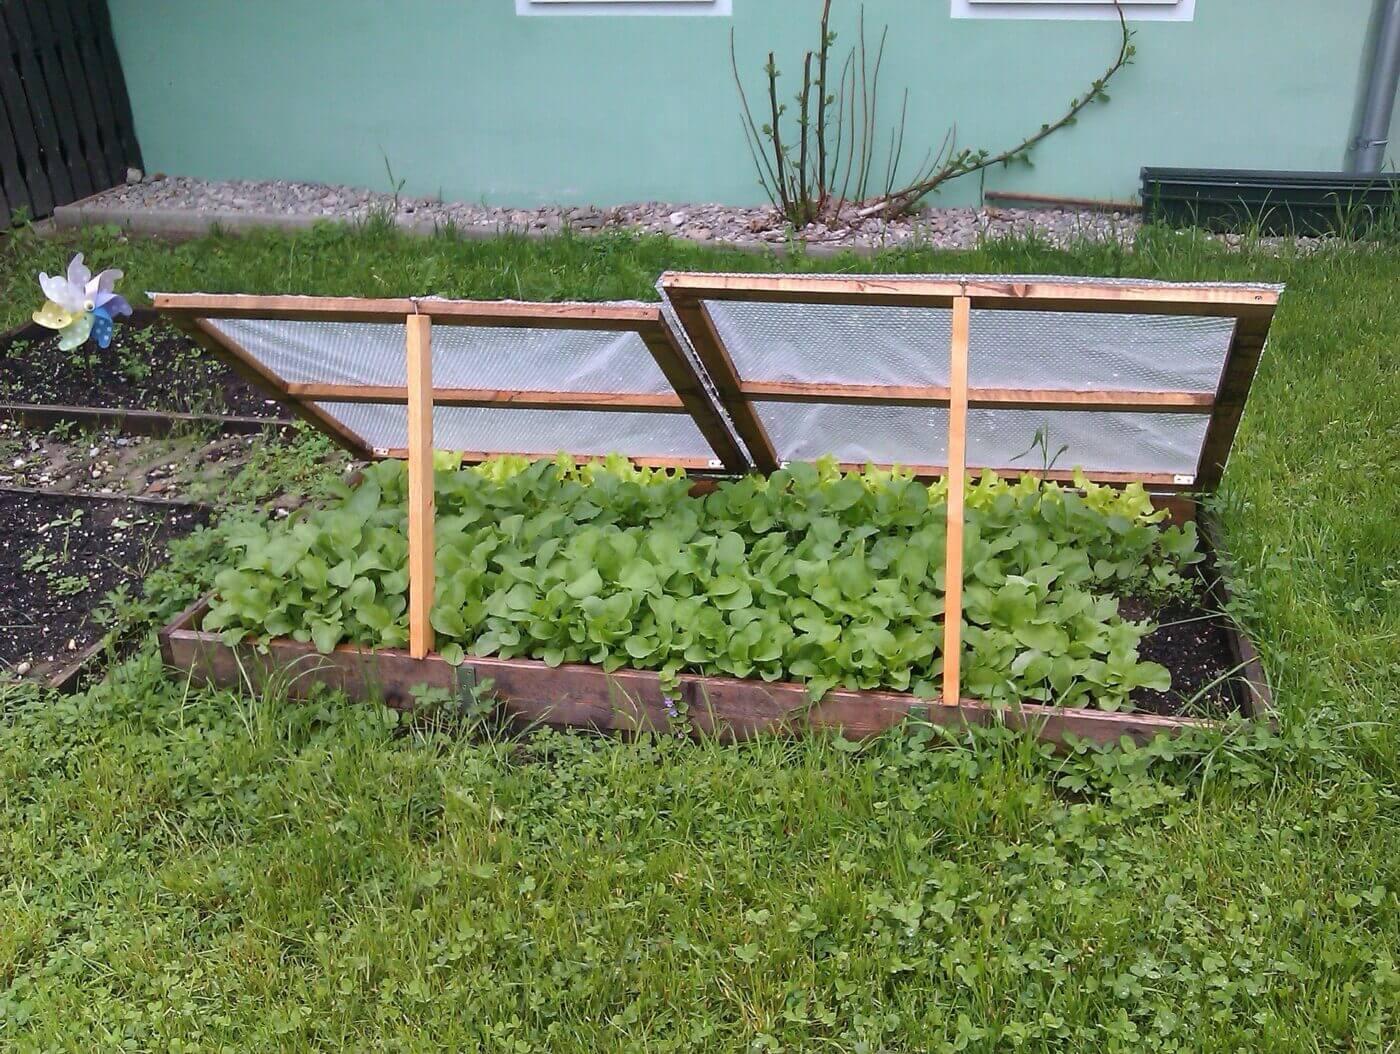 Cold frame for gardening